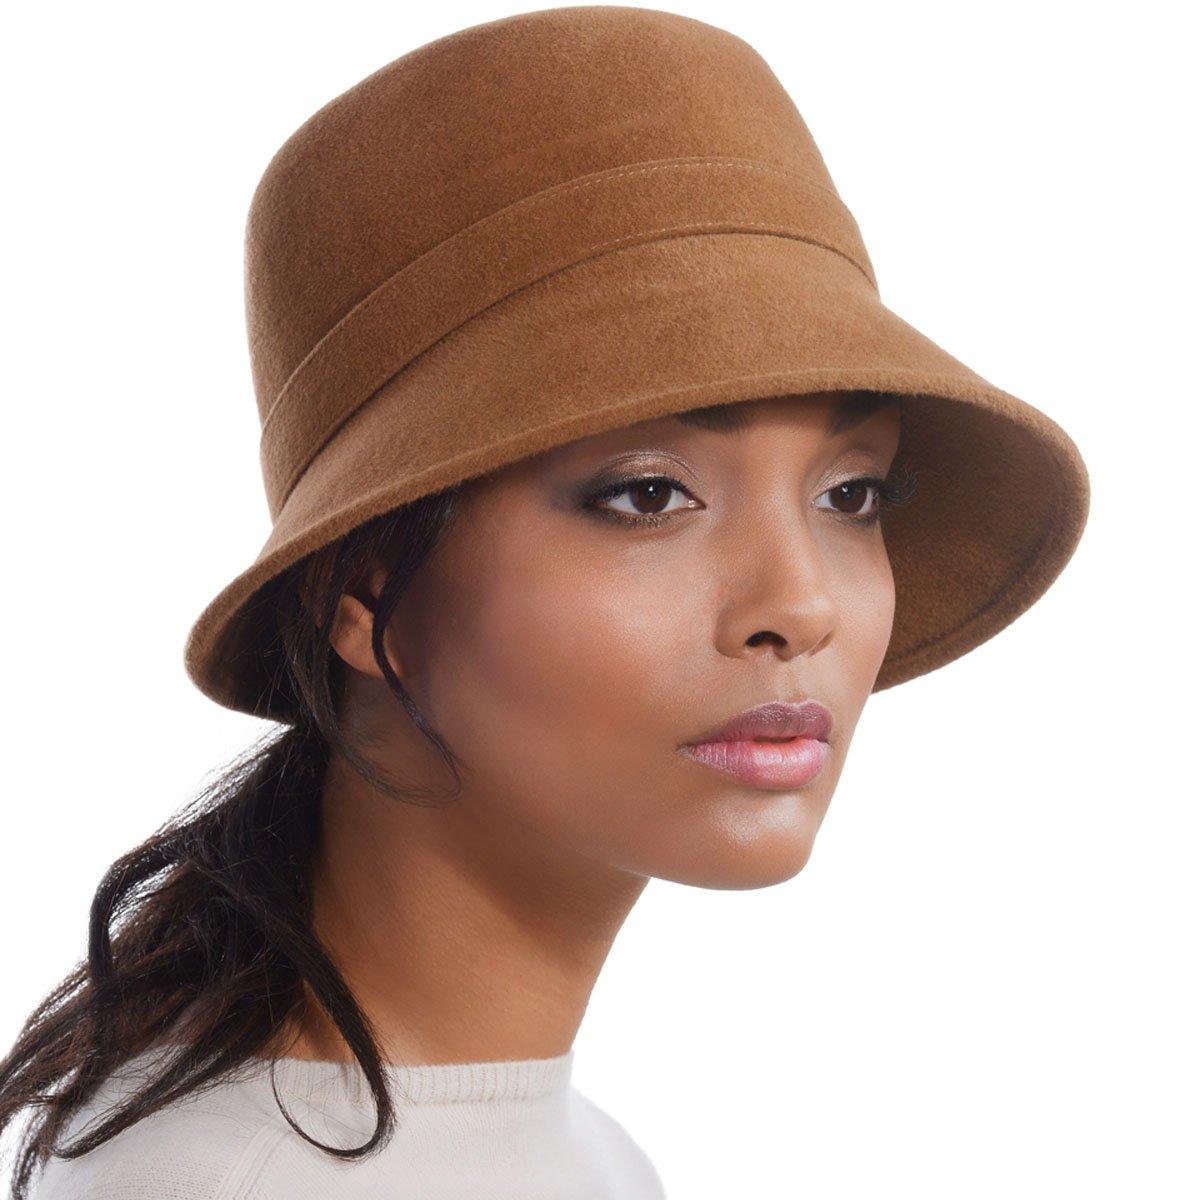 Eric Javits Luxury Designer Women's Fashion Headwear Hat - Hillary - Bronze